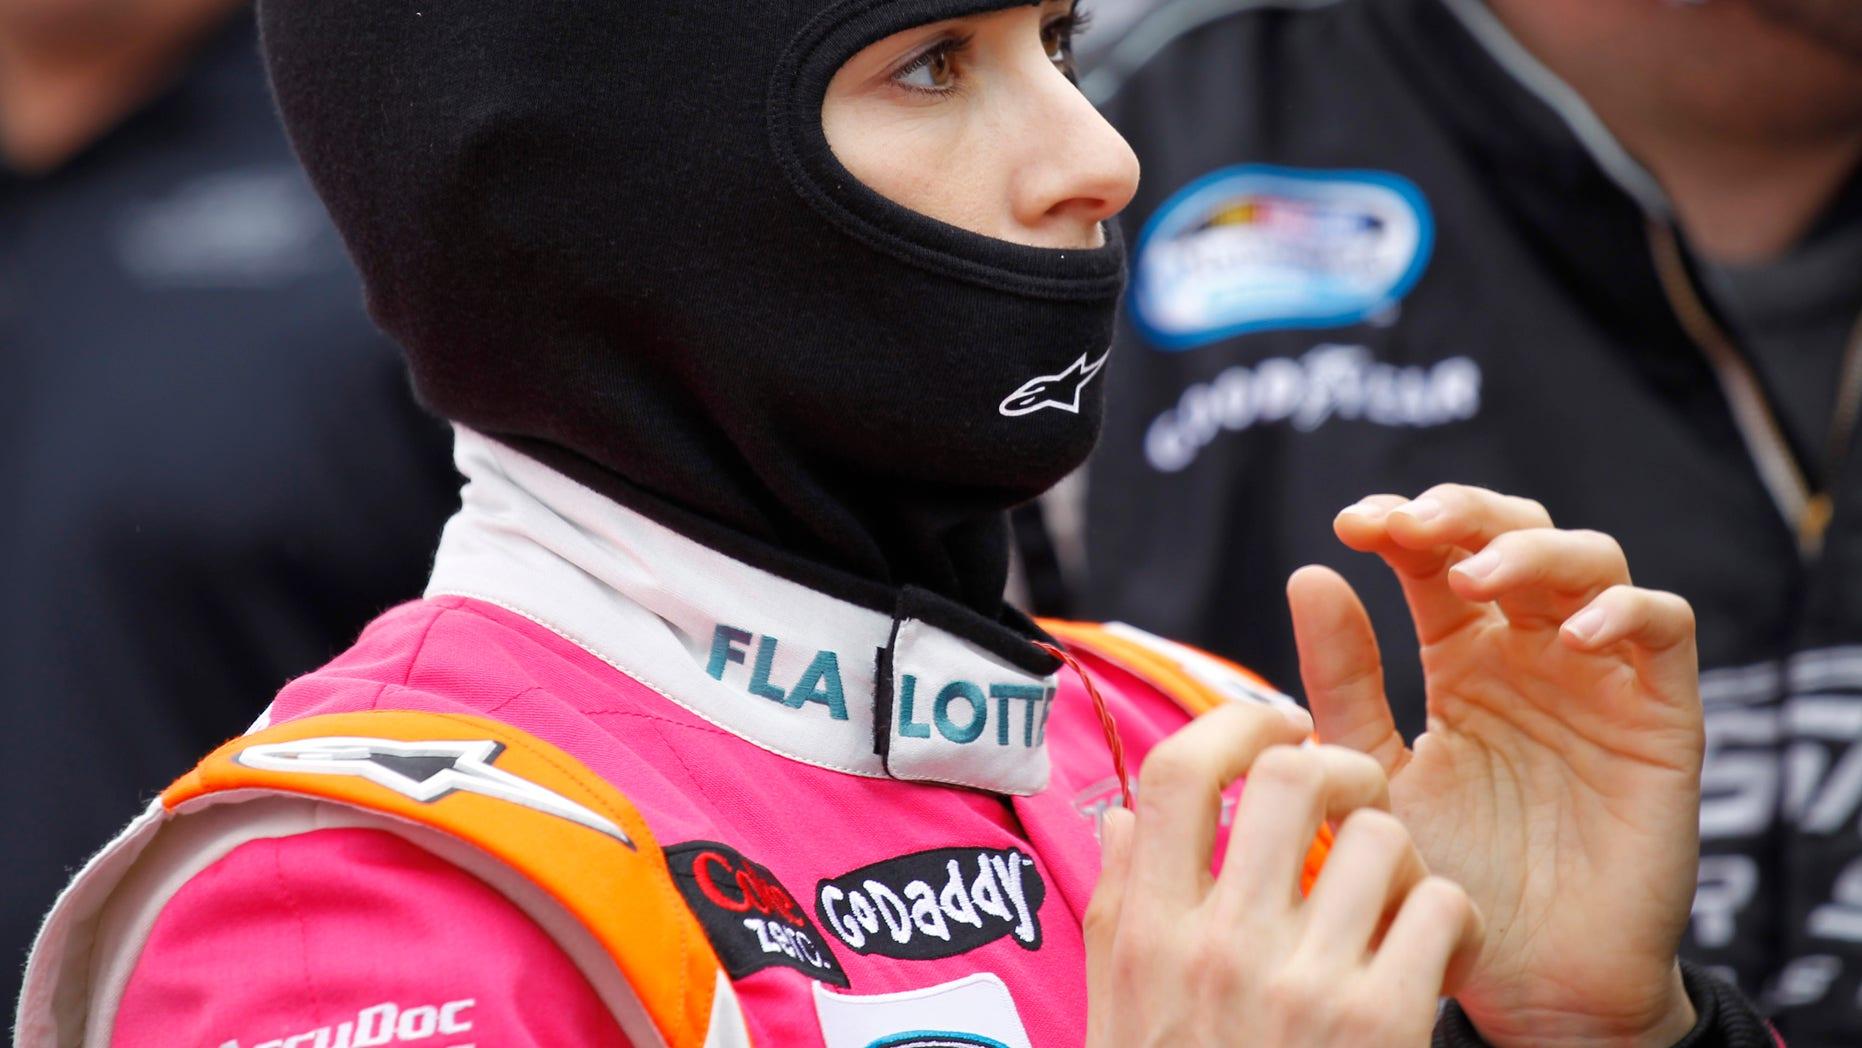 Danica Patrick prepares for the NASCAR Nationwide series auto race at Daytona International Speedway in Daytona Beach, Fla., Saturday, Feb. 22, 2014. (AP Photo/Terry Renna)